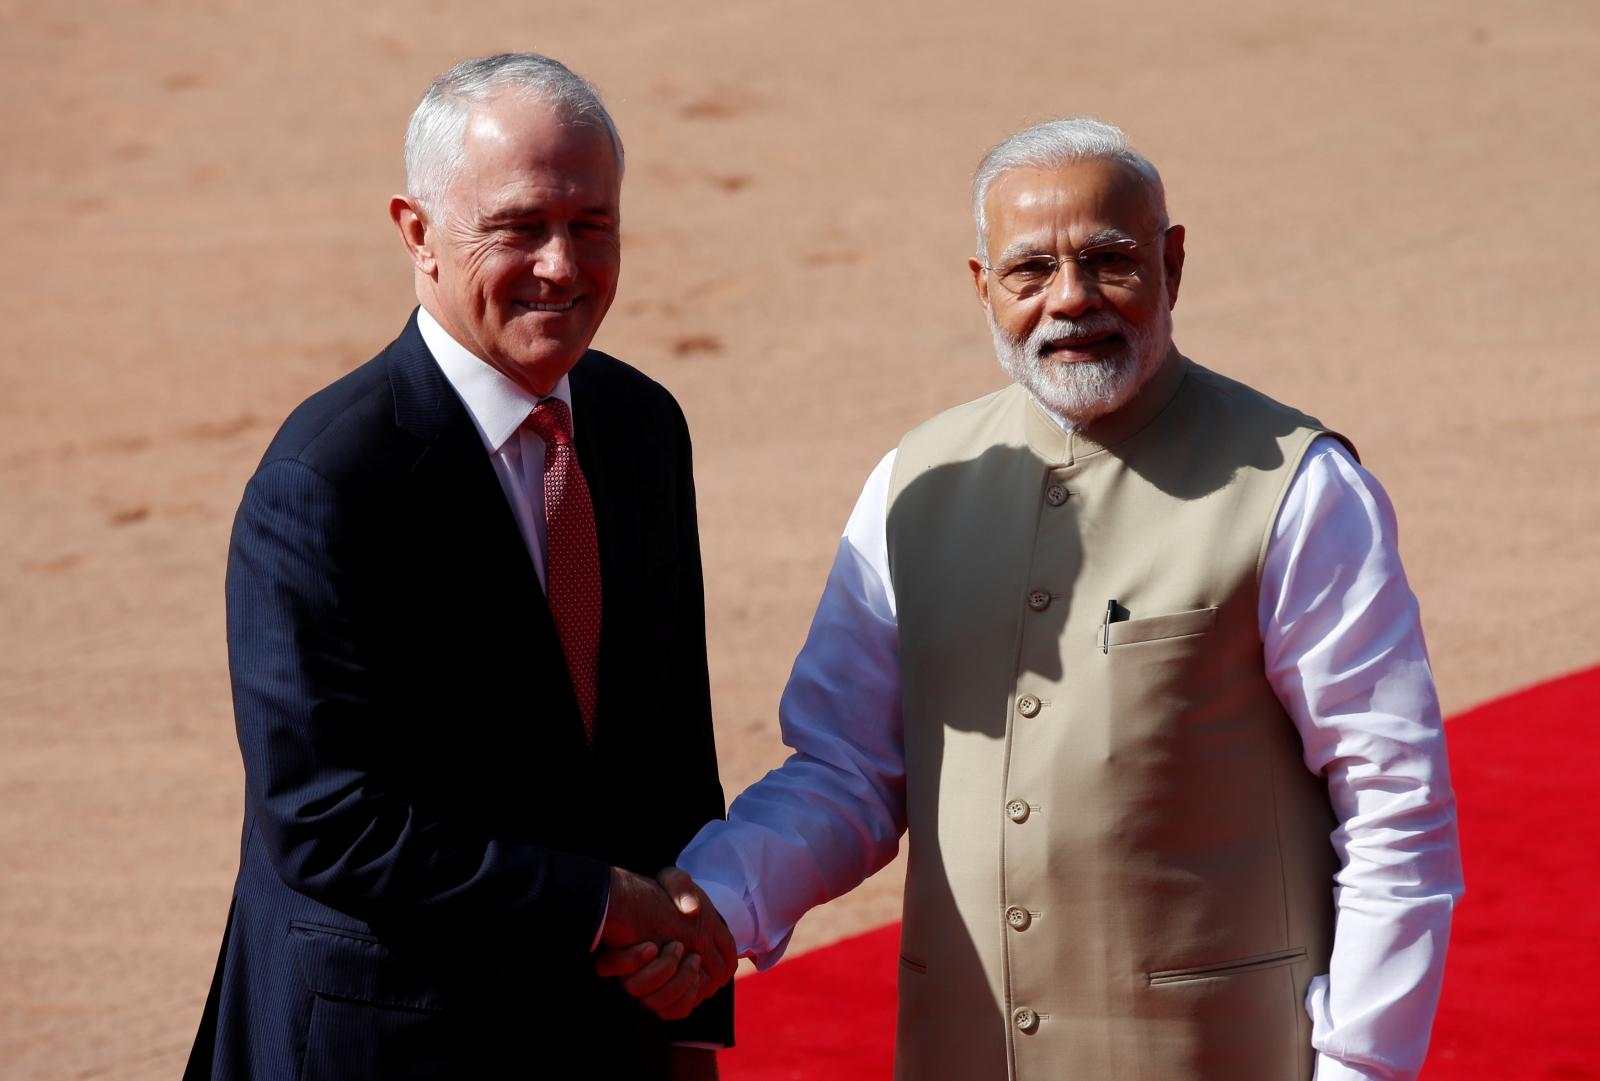 Turnbull and Modi